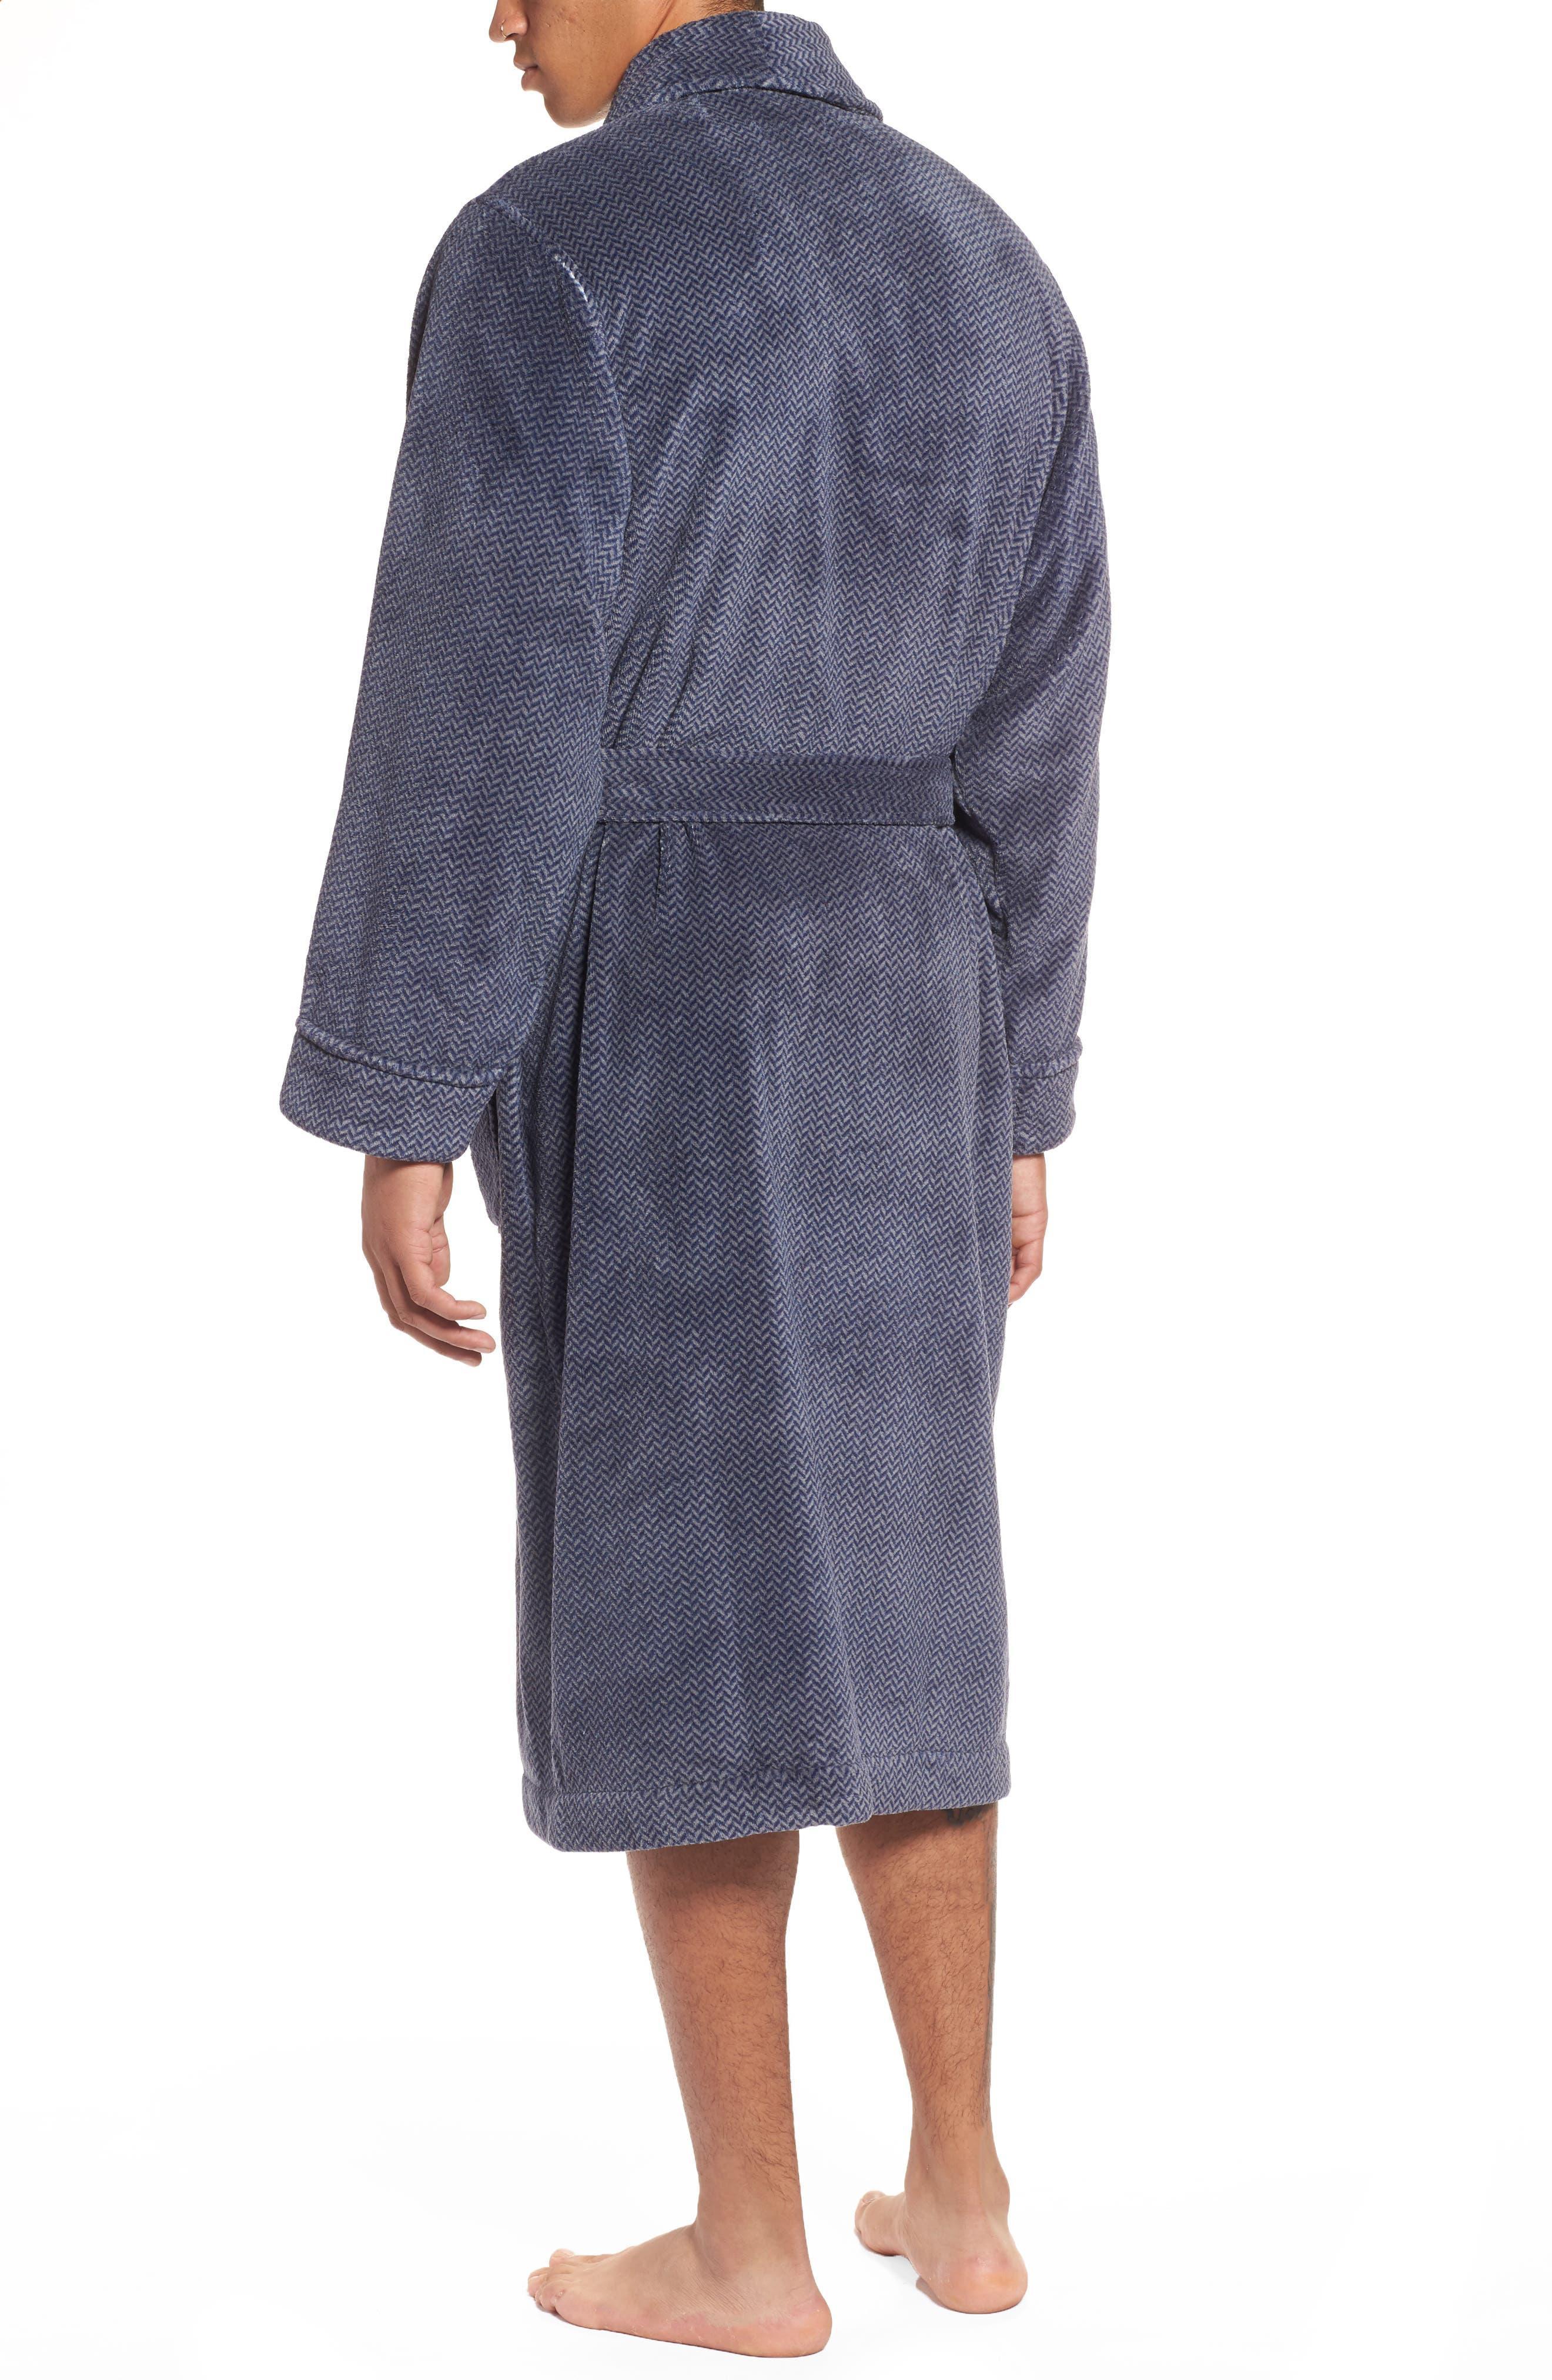 Herringbone Fleece Robe,                             Alternate thumbnail 2, color,                             NAVY INDIGO- GREY HERRINGBONE